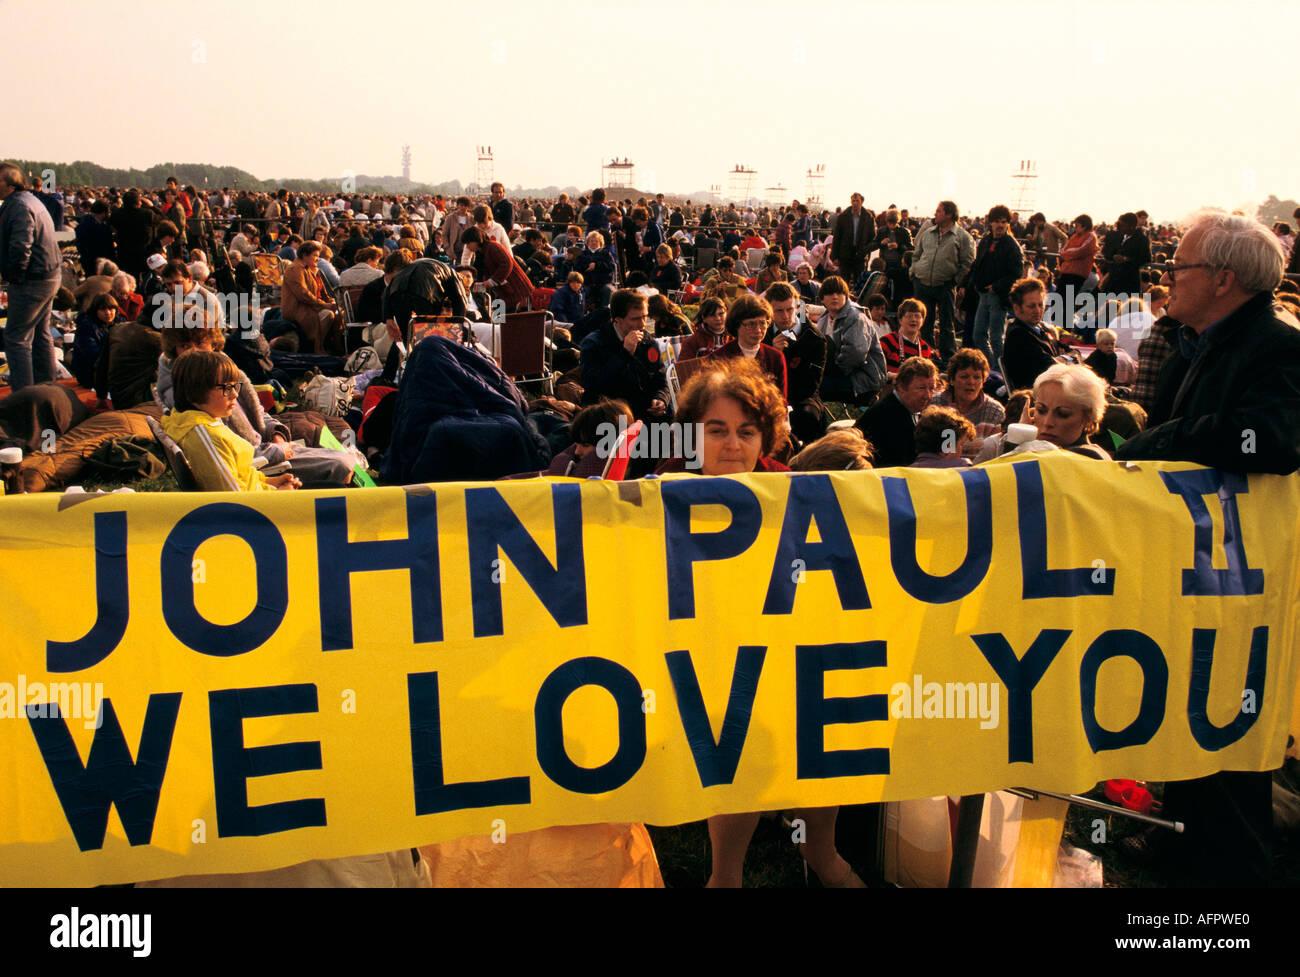 POPE JOHN PAUL II SCOTLAND 1982 'we love you banner' HOMER SYKES - Stock Image